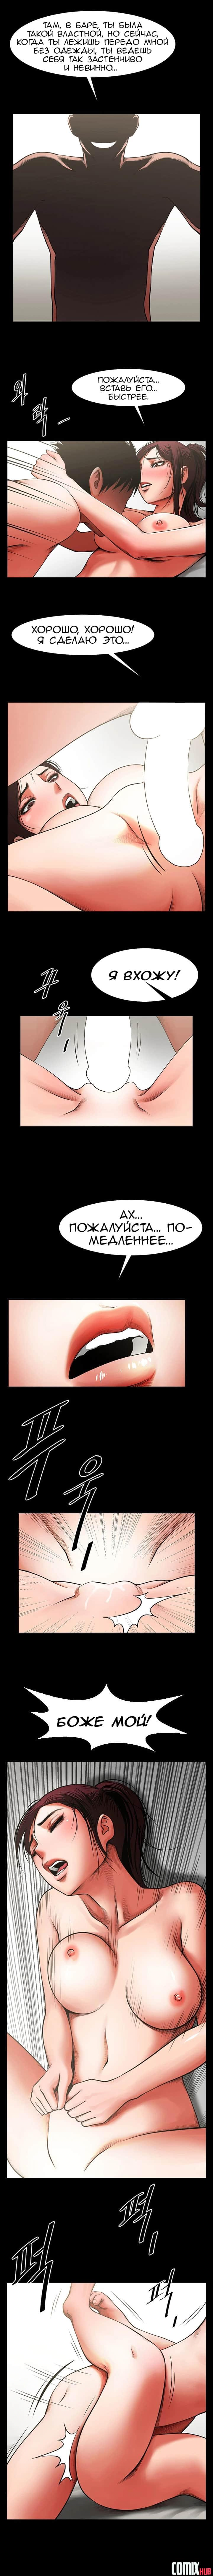 Хентай Манхва, Обмен девушкой, часть 5 Хентай манга, манхва, Измена, Минет